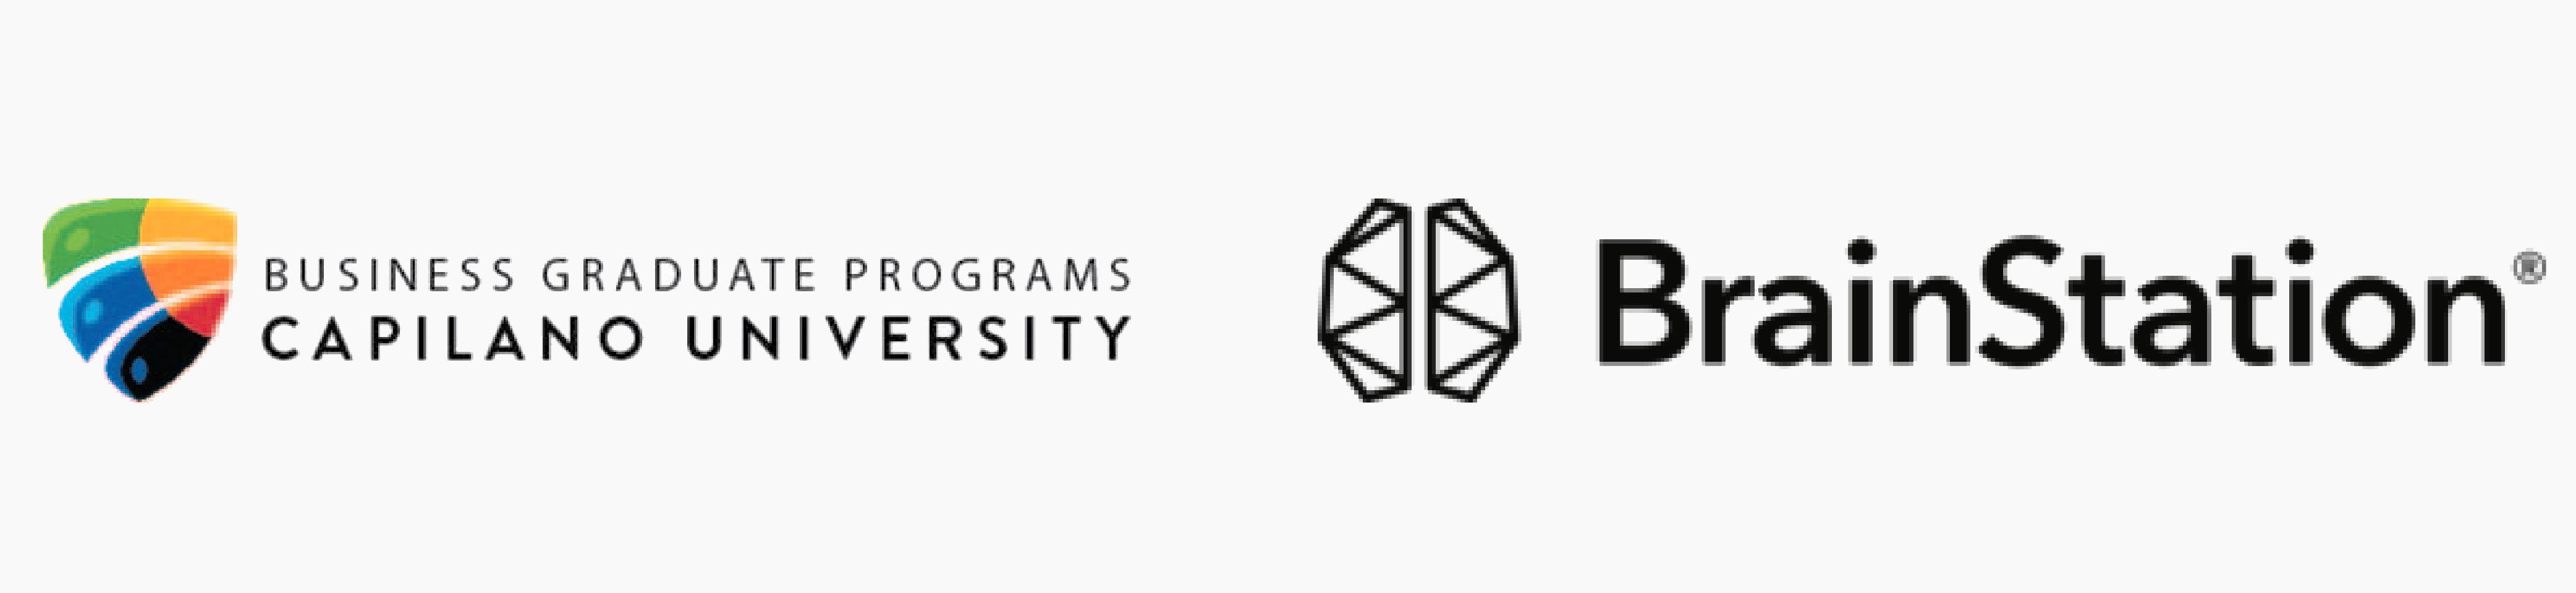 Grad Fair 2019 Platinum Sponsors - Capilano University, BrainStation